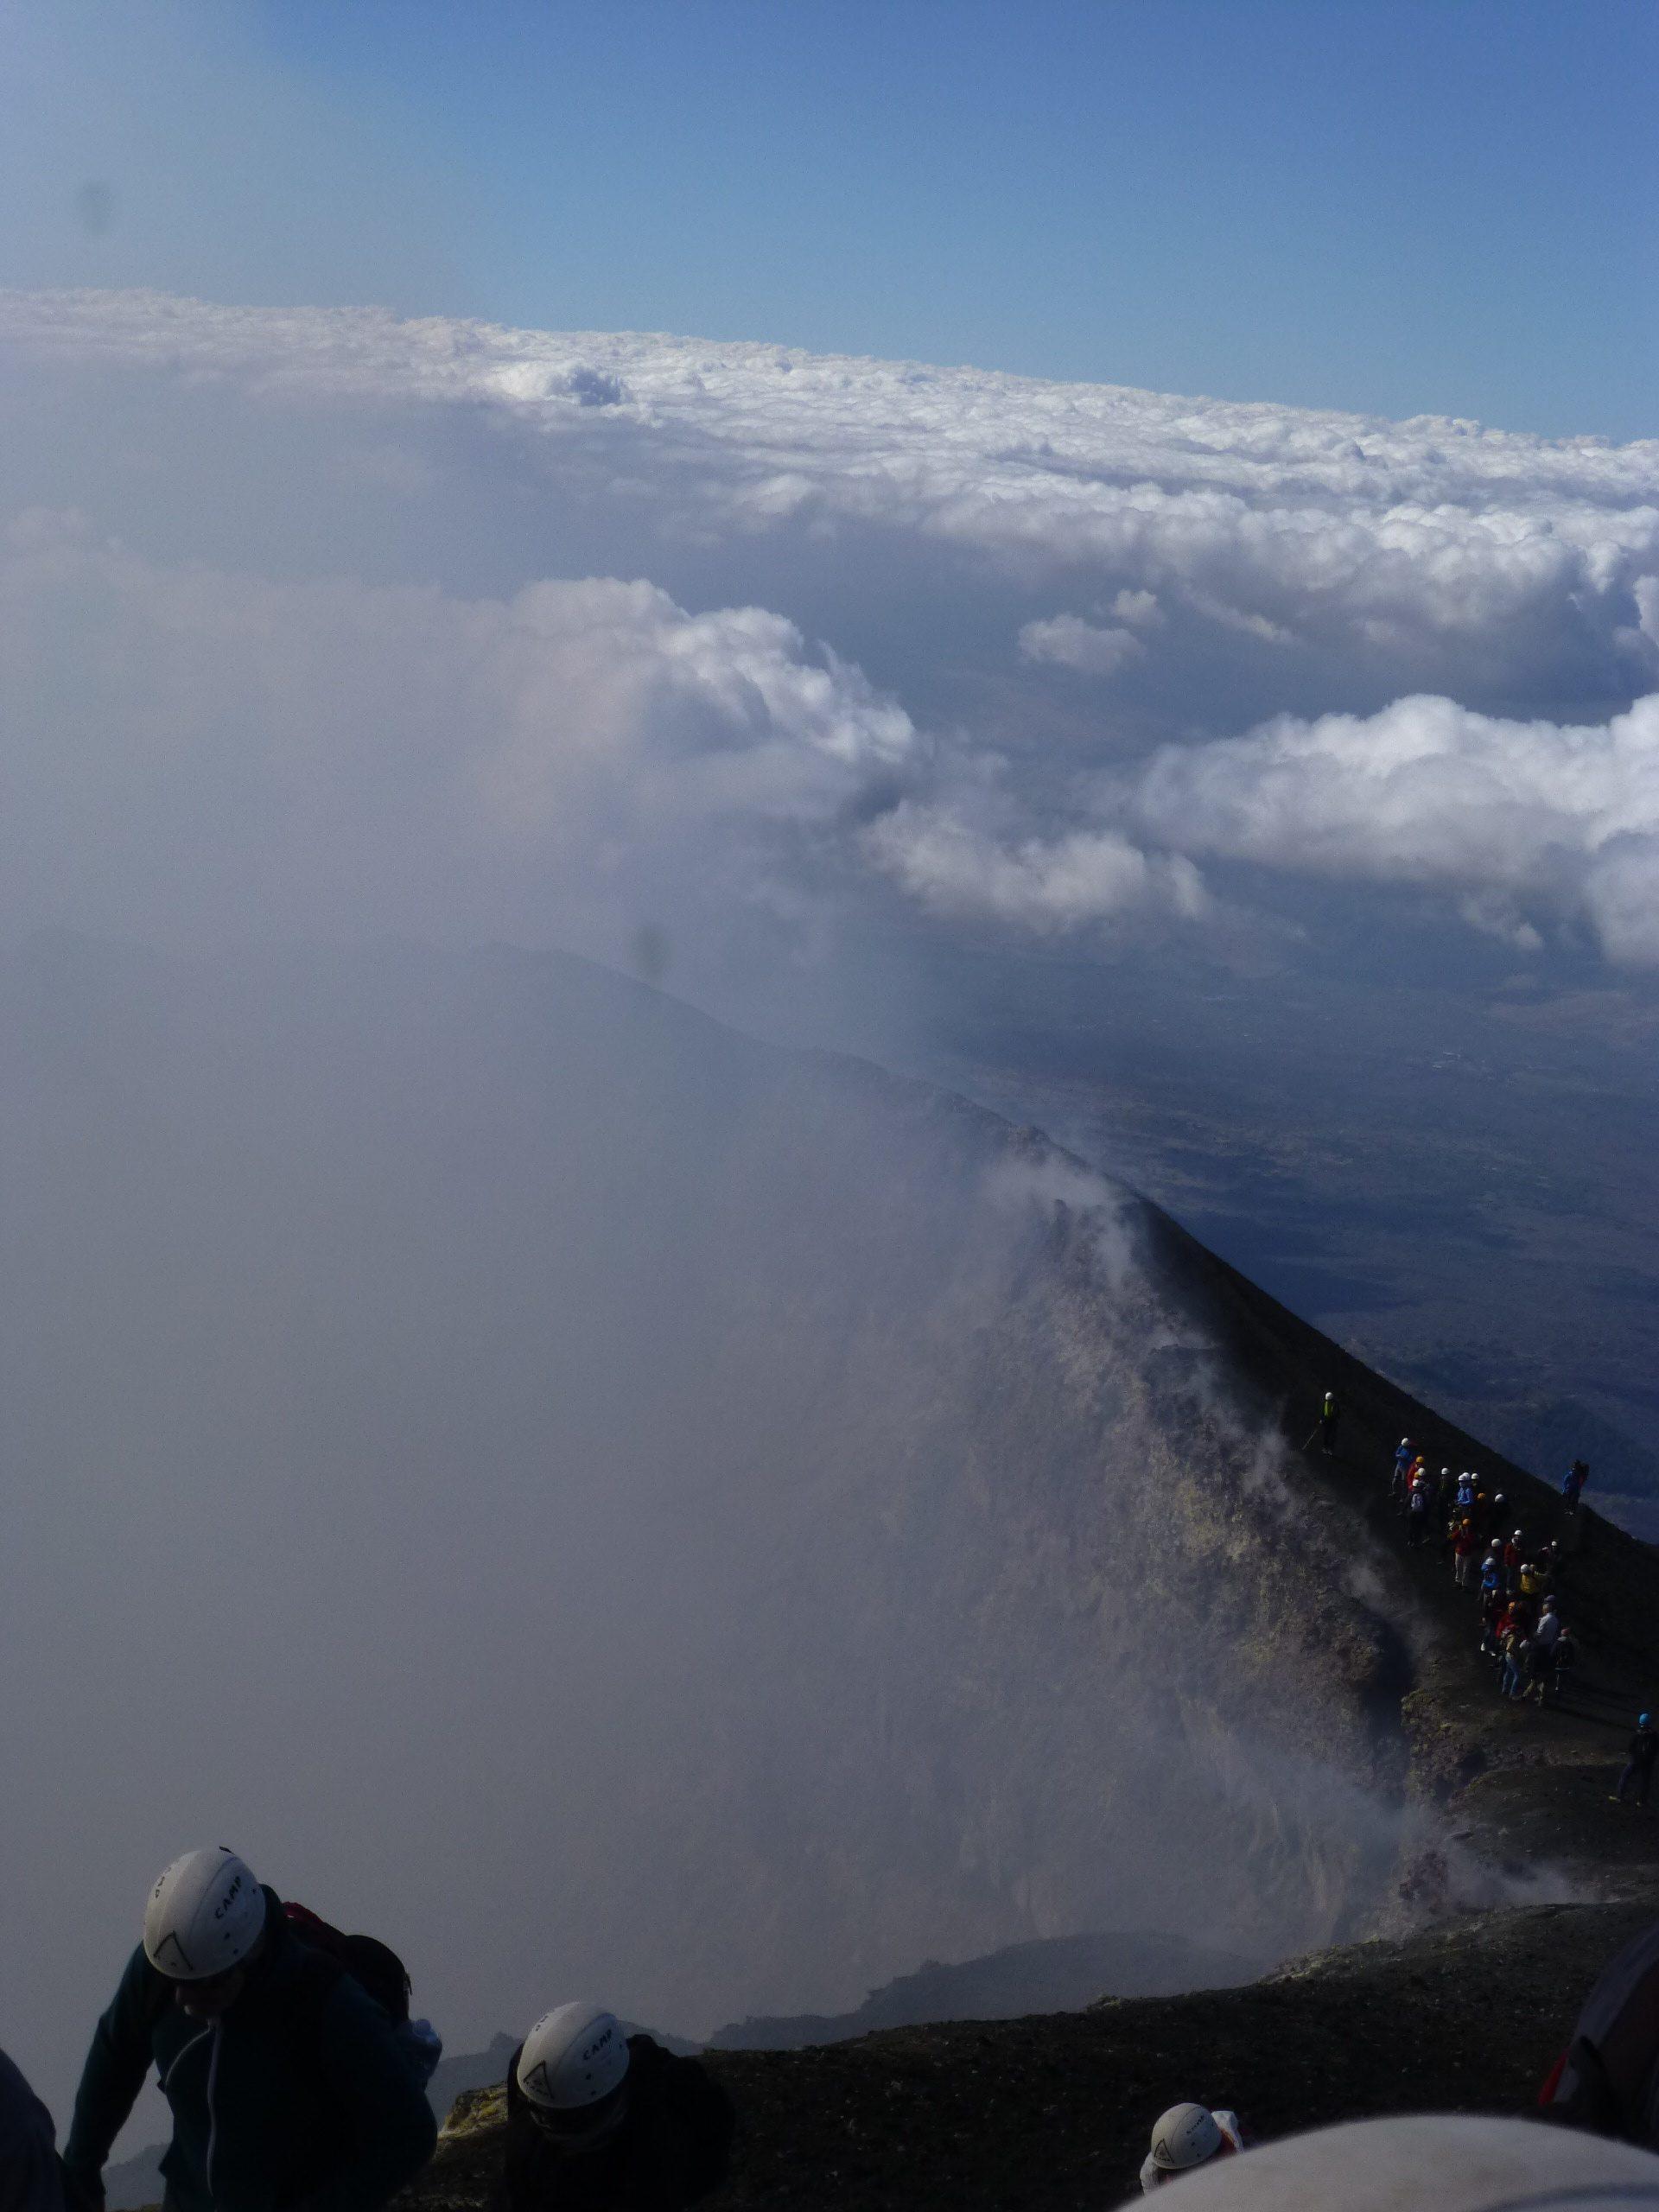 Am Randes des Kraters des Ätnas